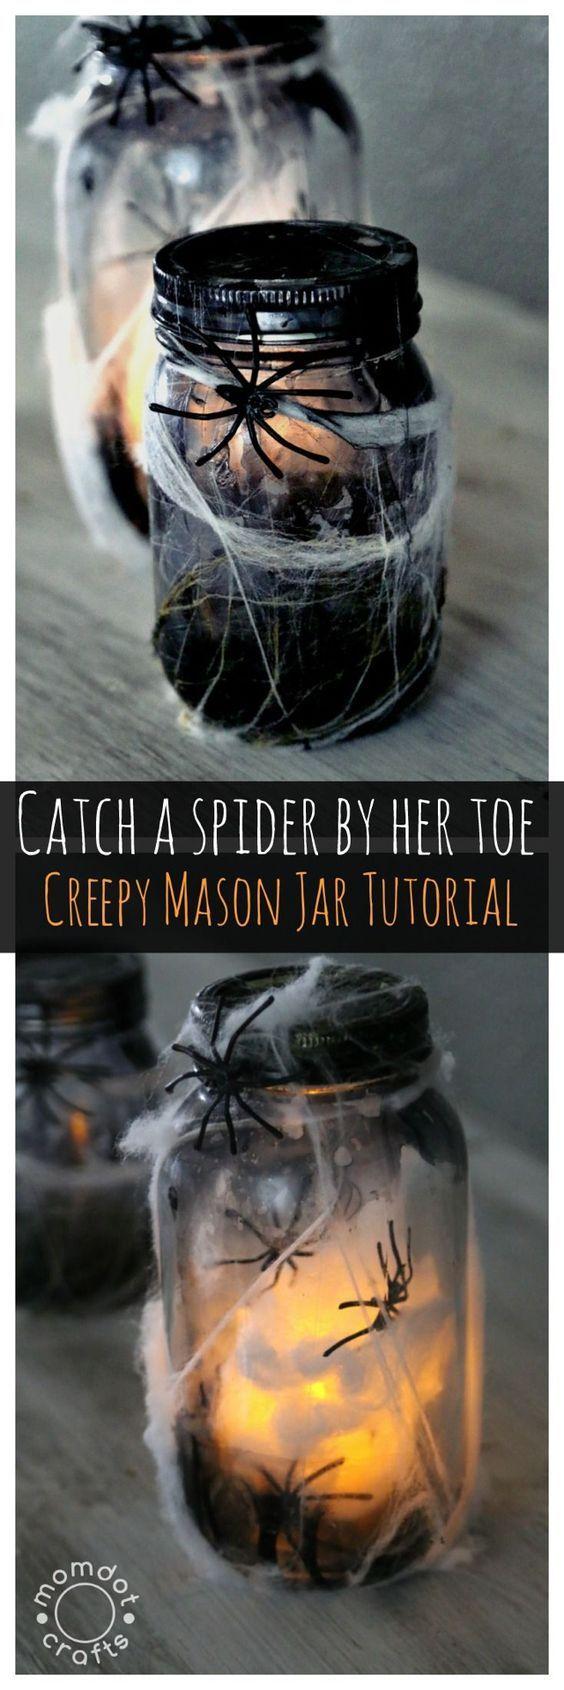 30+ Homemade Halloween Decoration Ideas Mason jar crafts, Creepy - cool homemade halloween decorations